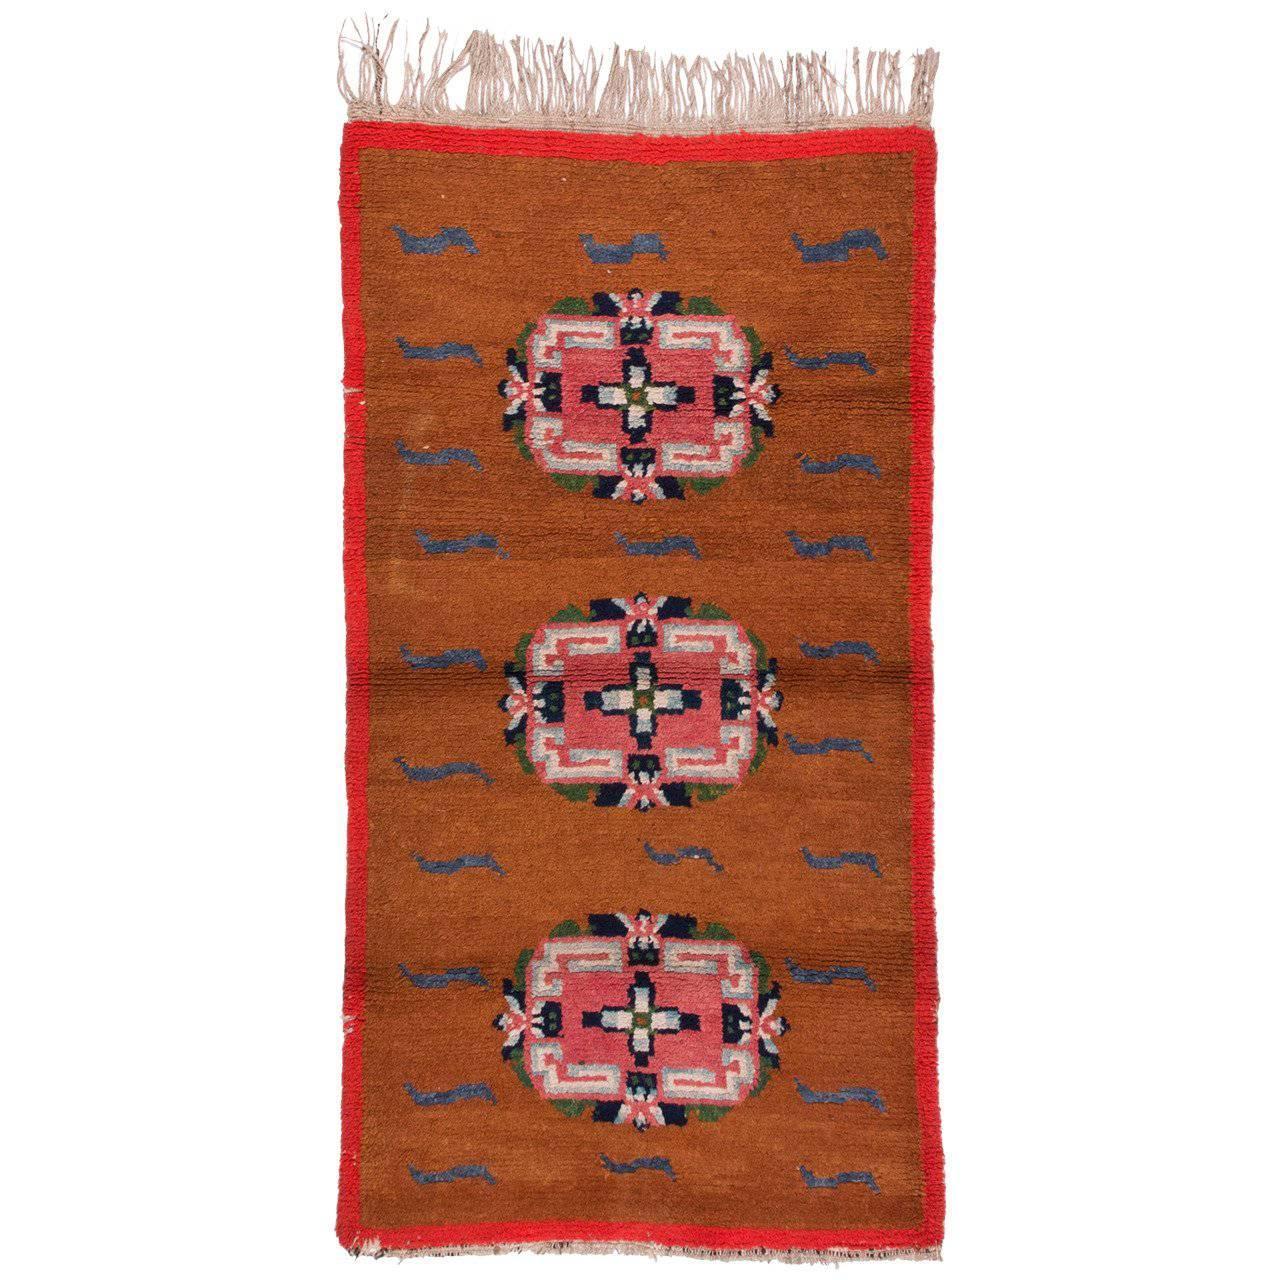 Antique Tibetan Rug with Tiger Stripes 2.6x4.7